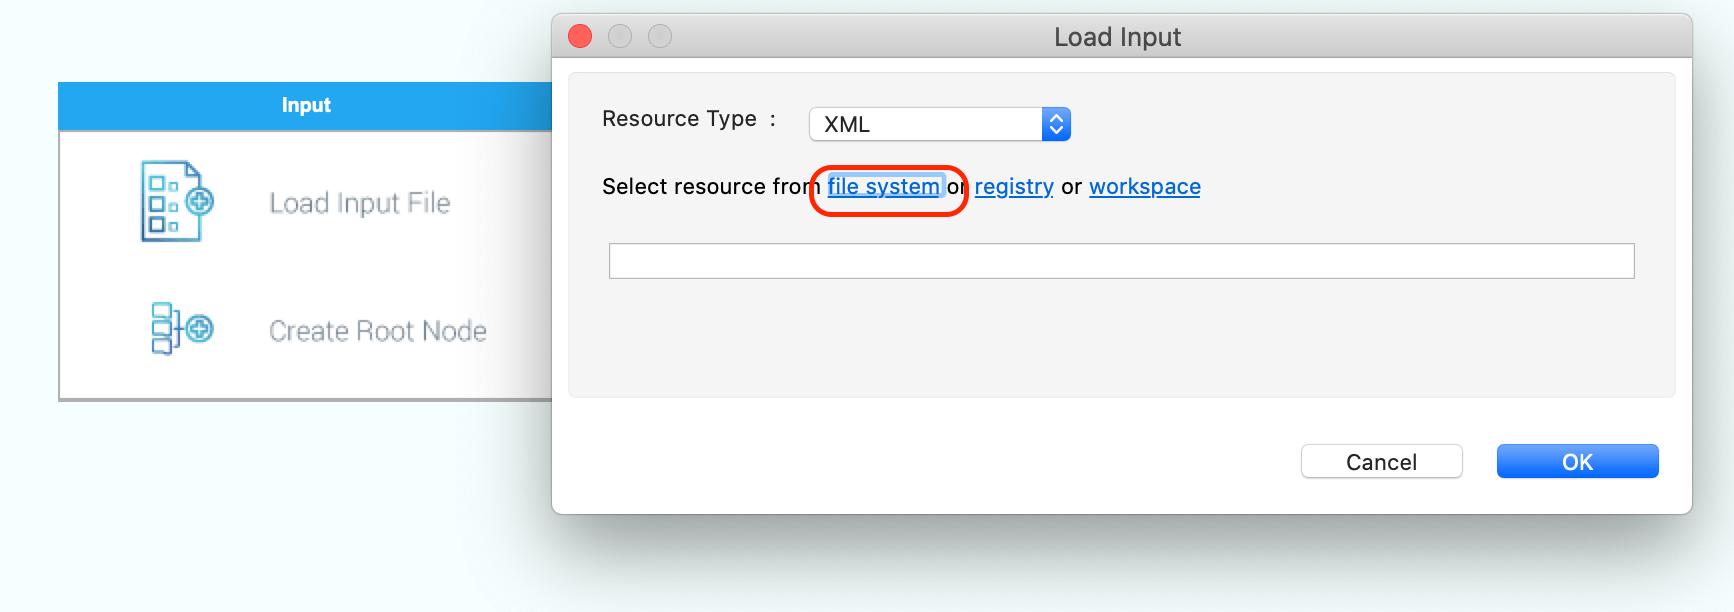 load input